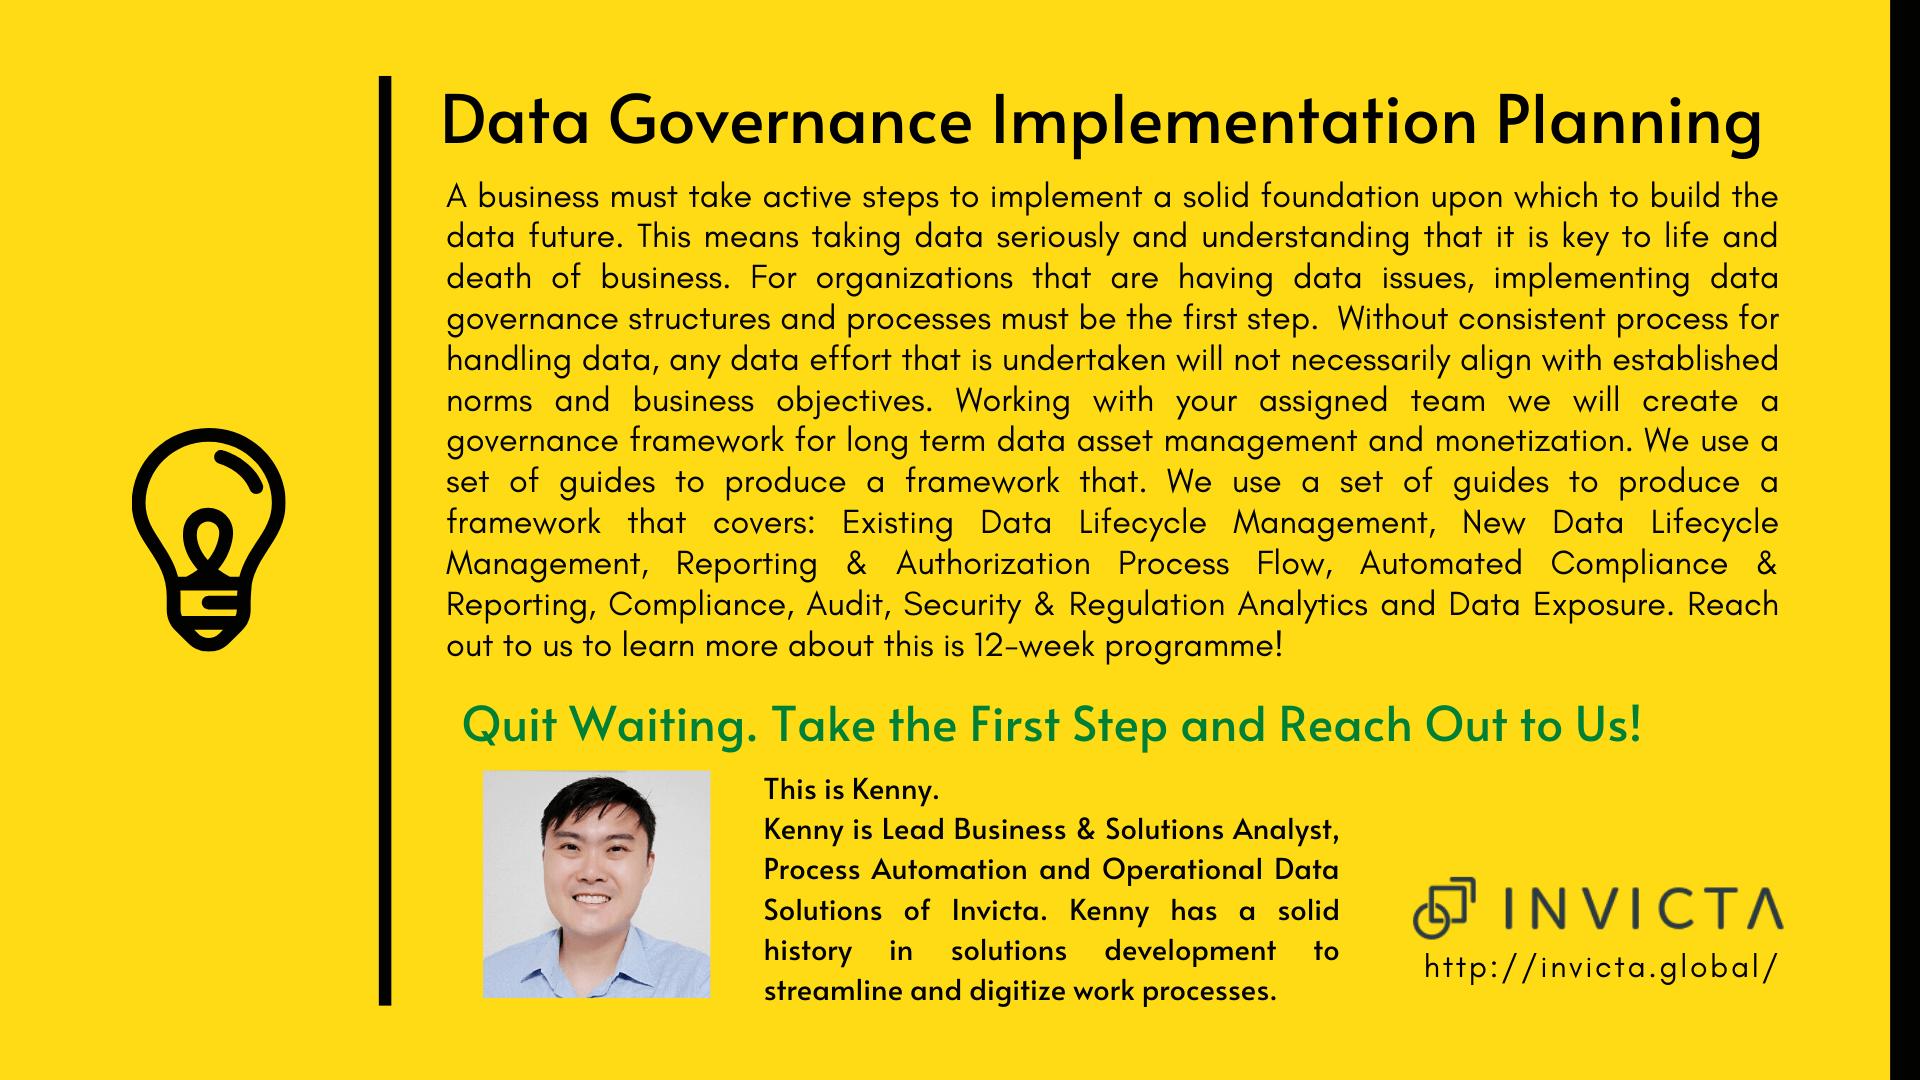 Innovation - Data Implementation Invicta Singapore Digital Transformation